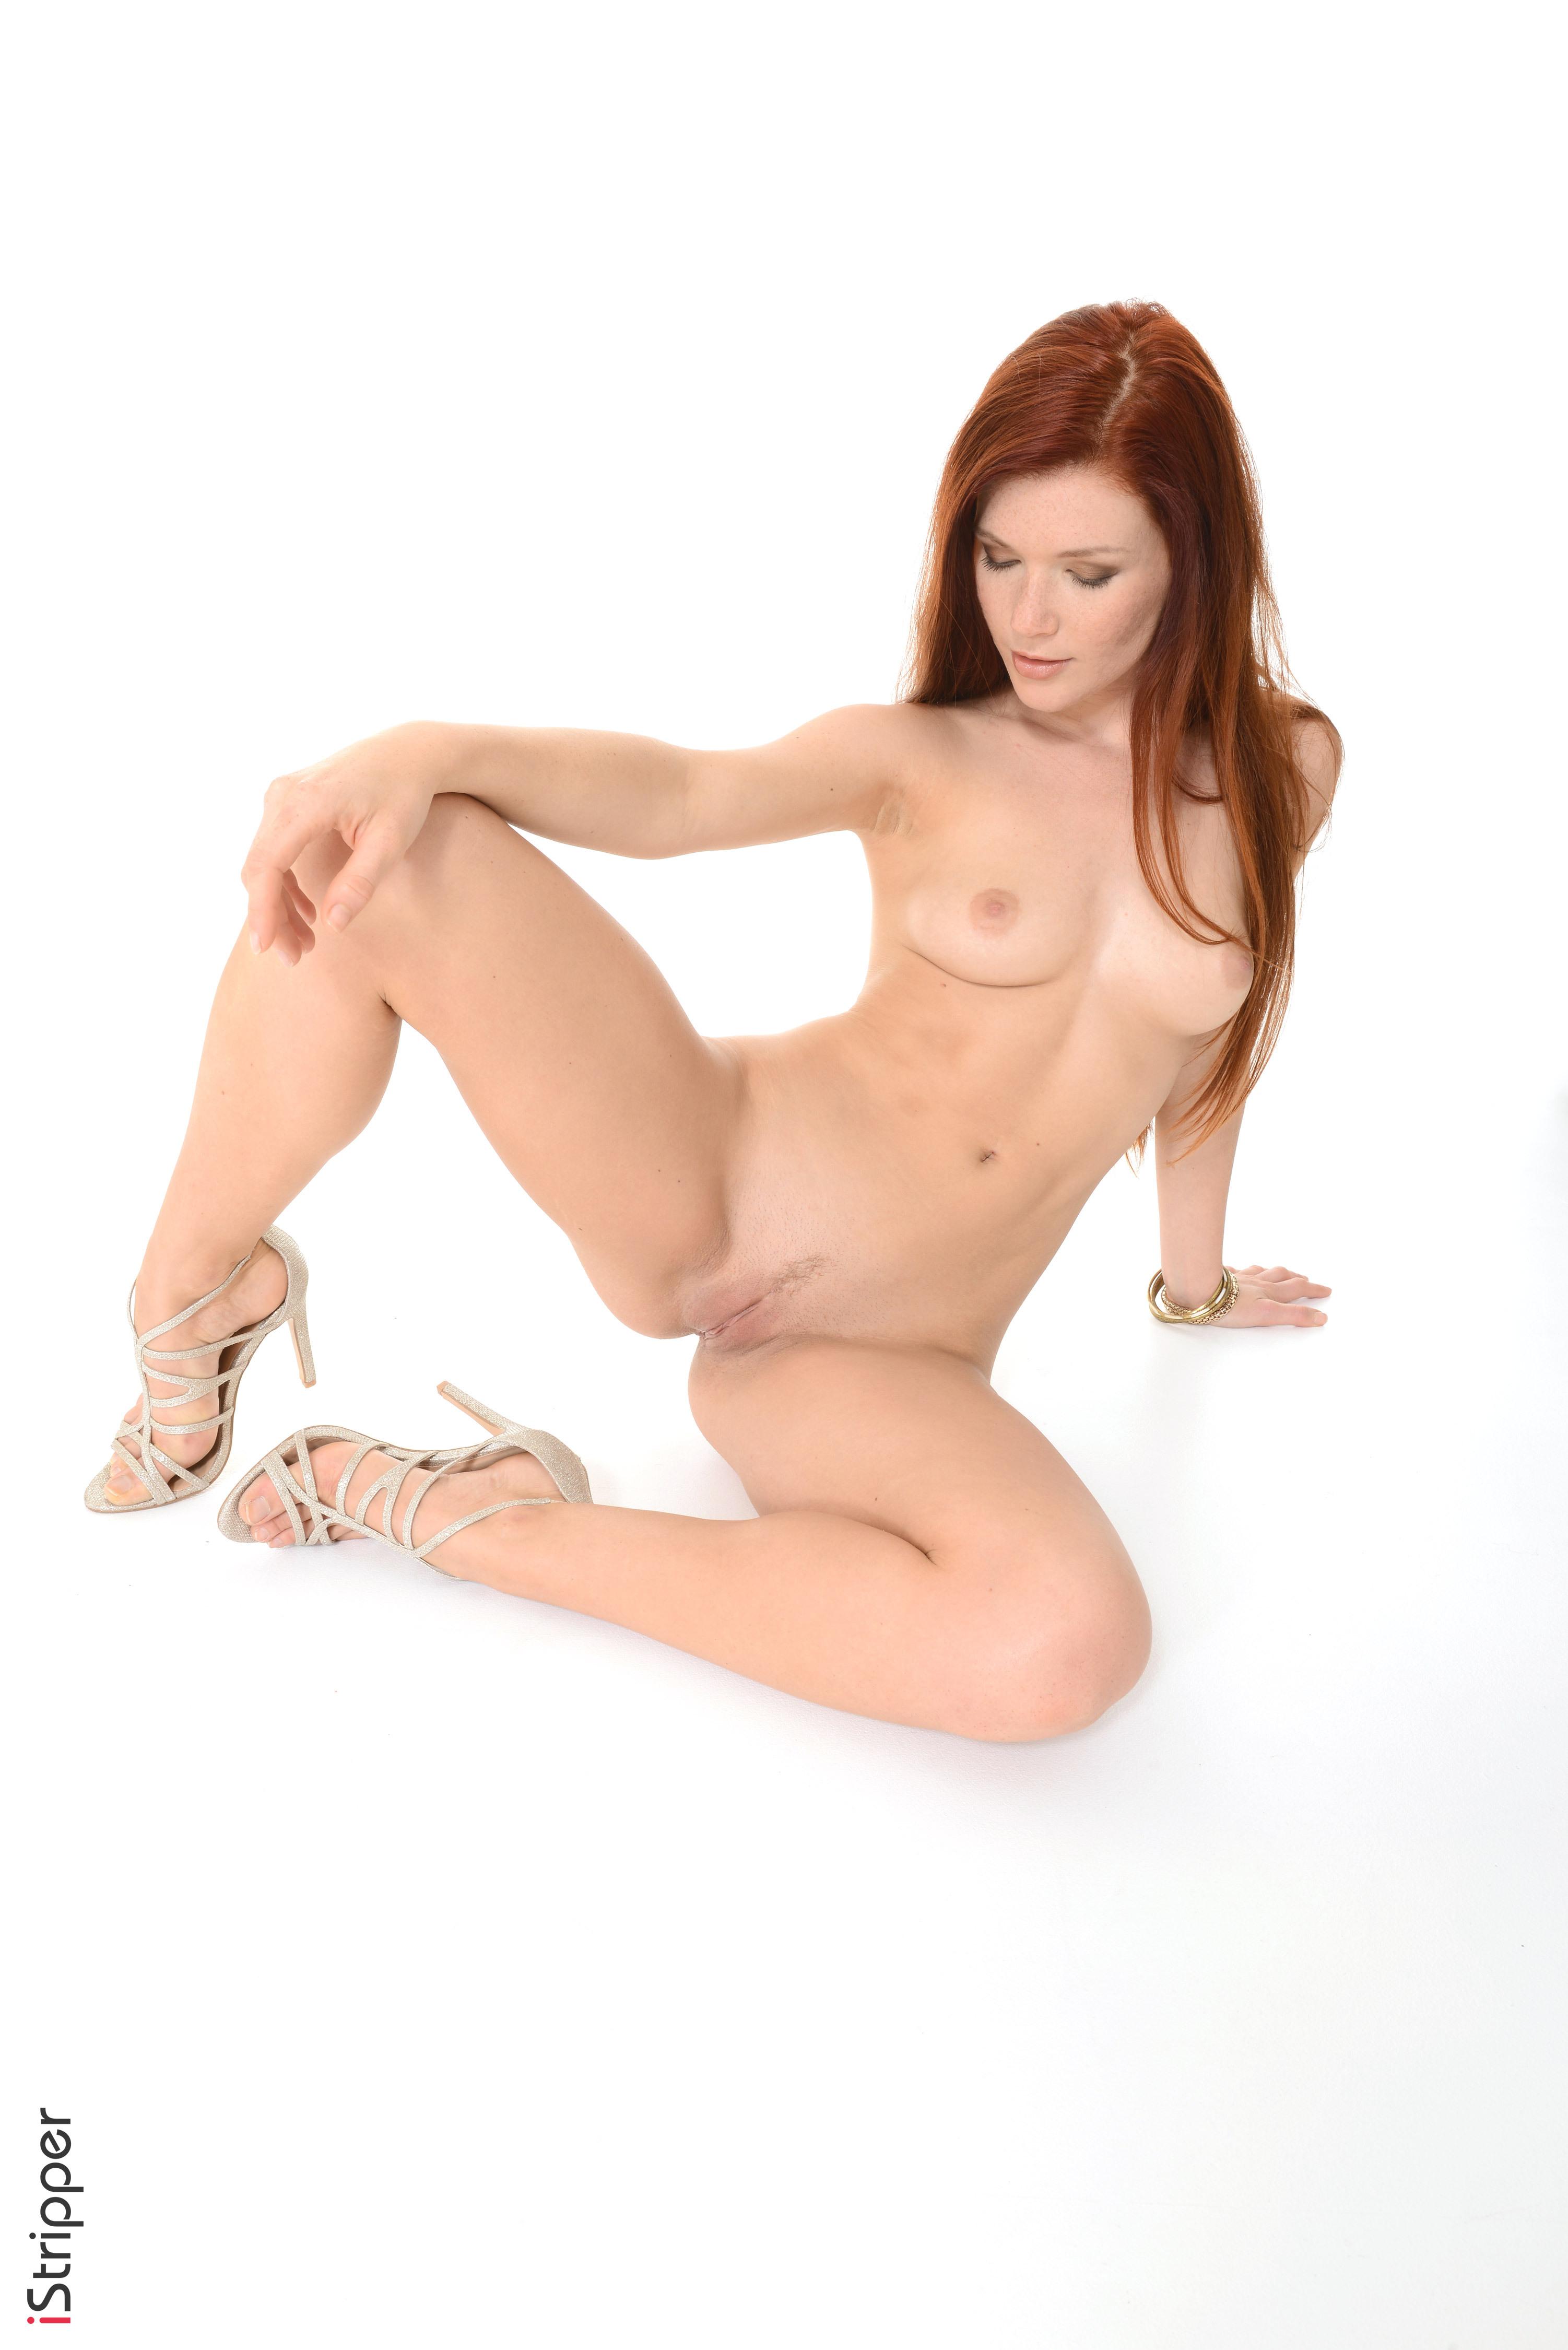 lisa ann sexy wallpaper